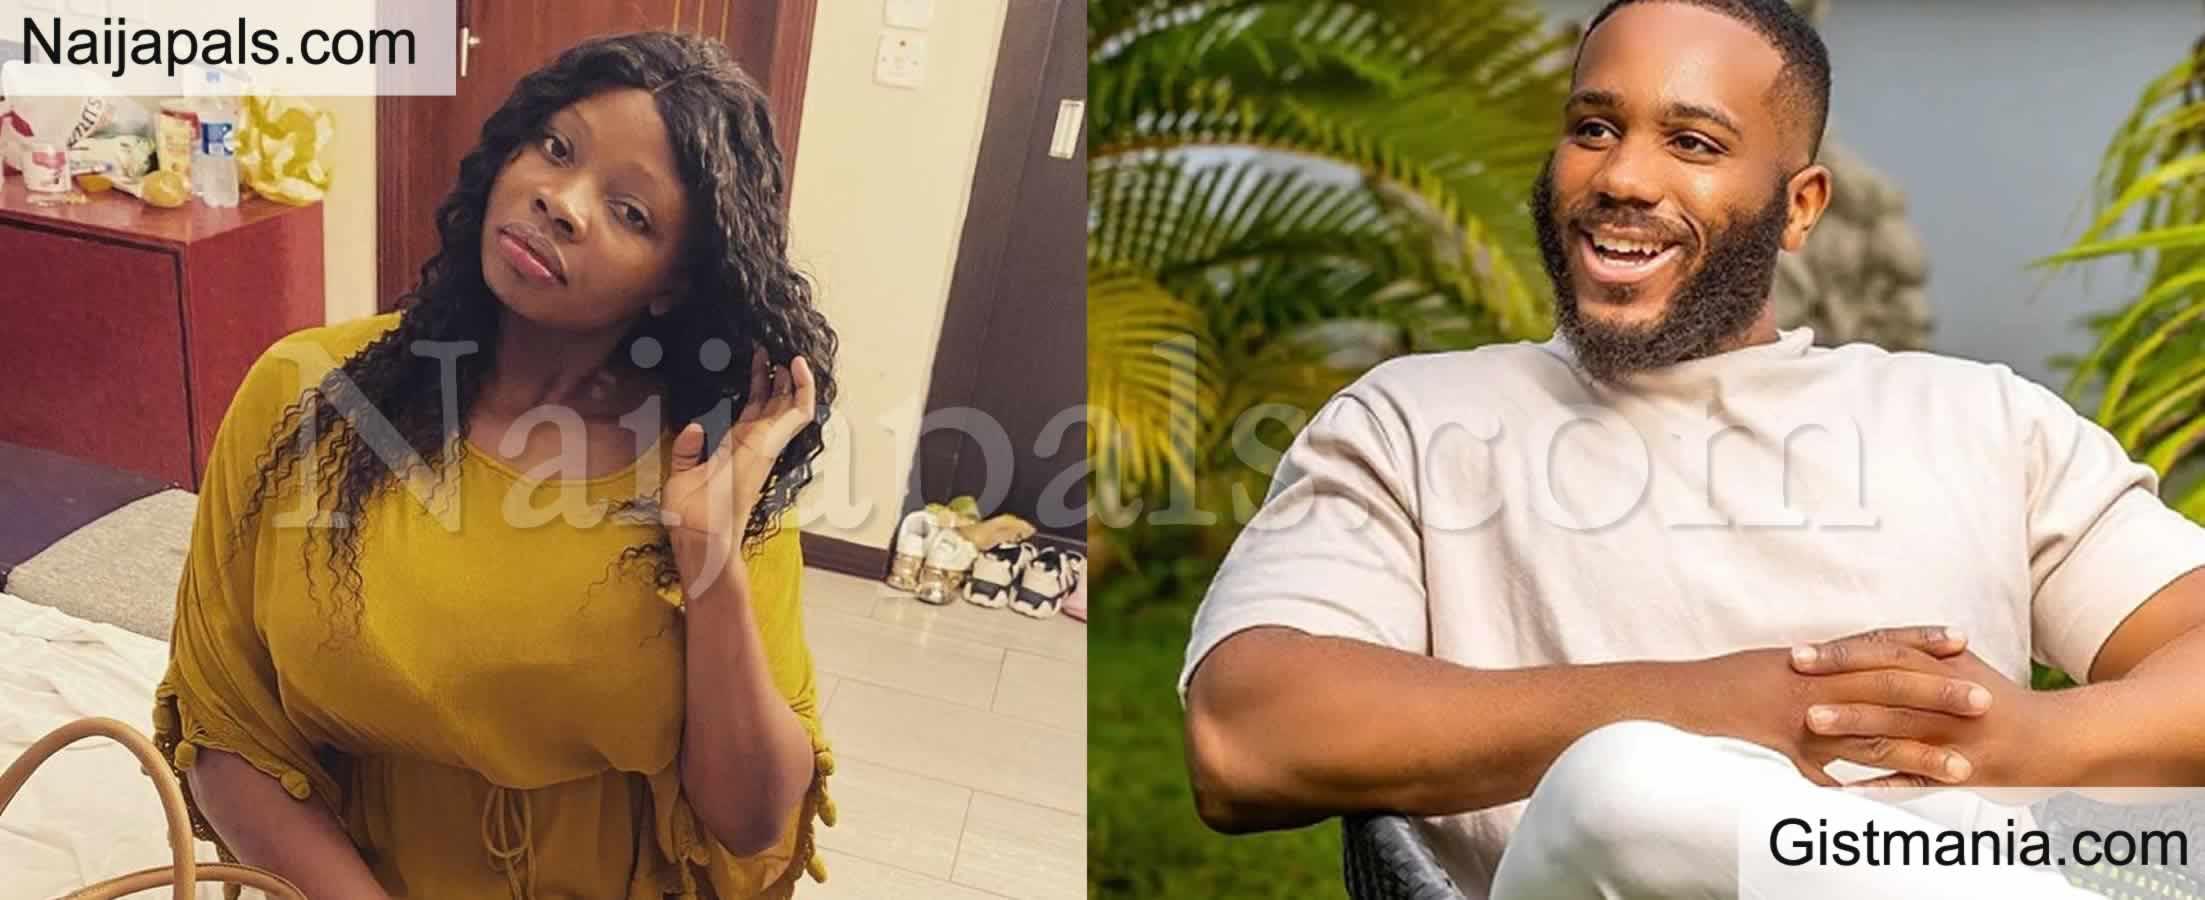 <img alt='.' class='lazyload' data-src='https://img.gistmania.com/emot/video.gif' /> VIDEO: <b>Busty Nigerian Lady Expresses Love For #BBNaija's Kiddwaya in The Weirdest of Ways</b>